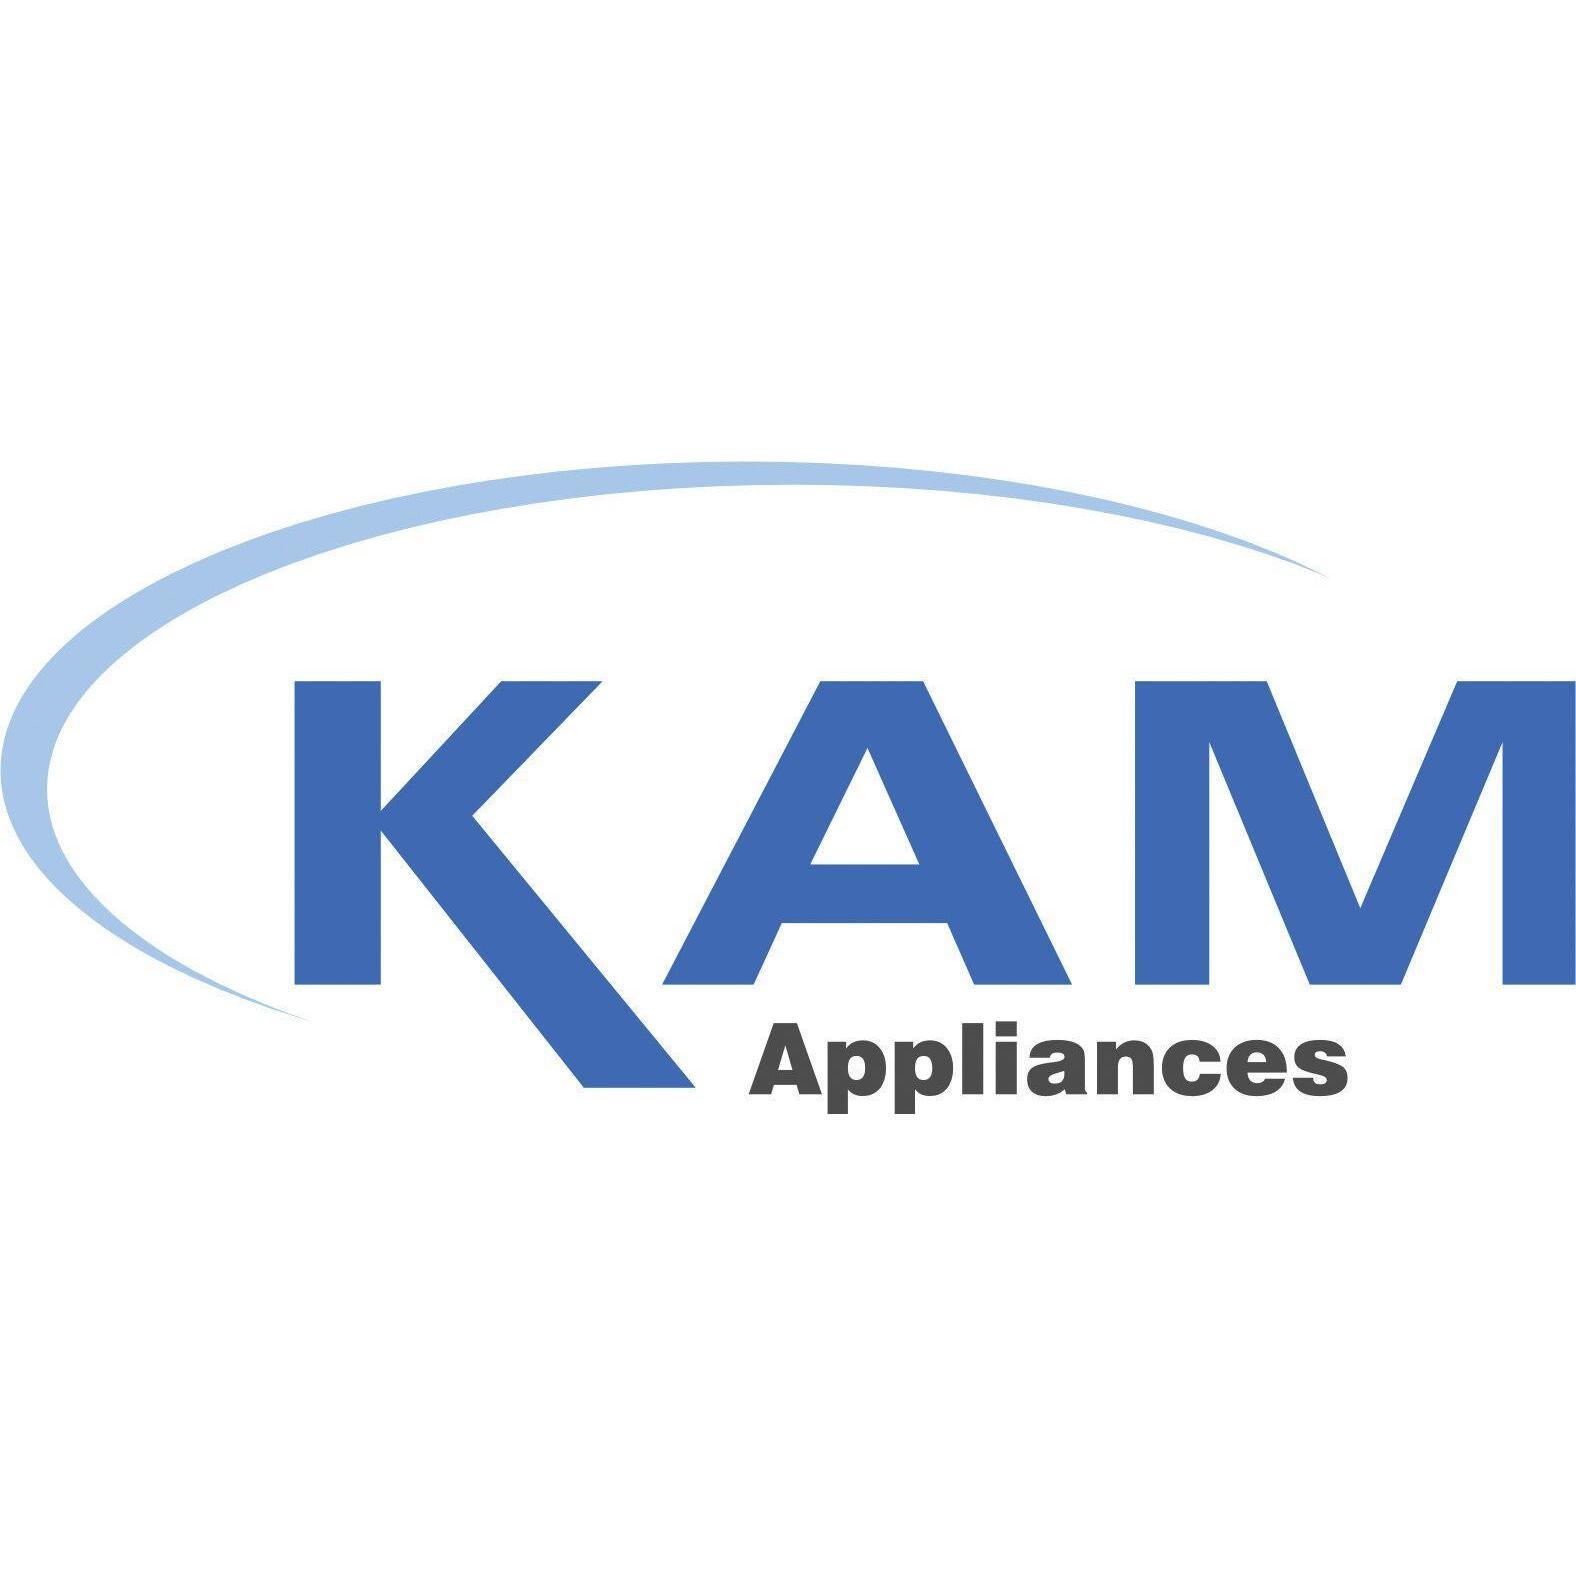 Kam Appliances - Sagamore Beach, MA - Appliance Stores